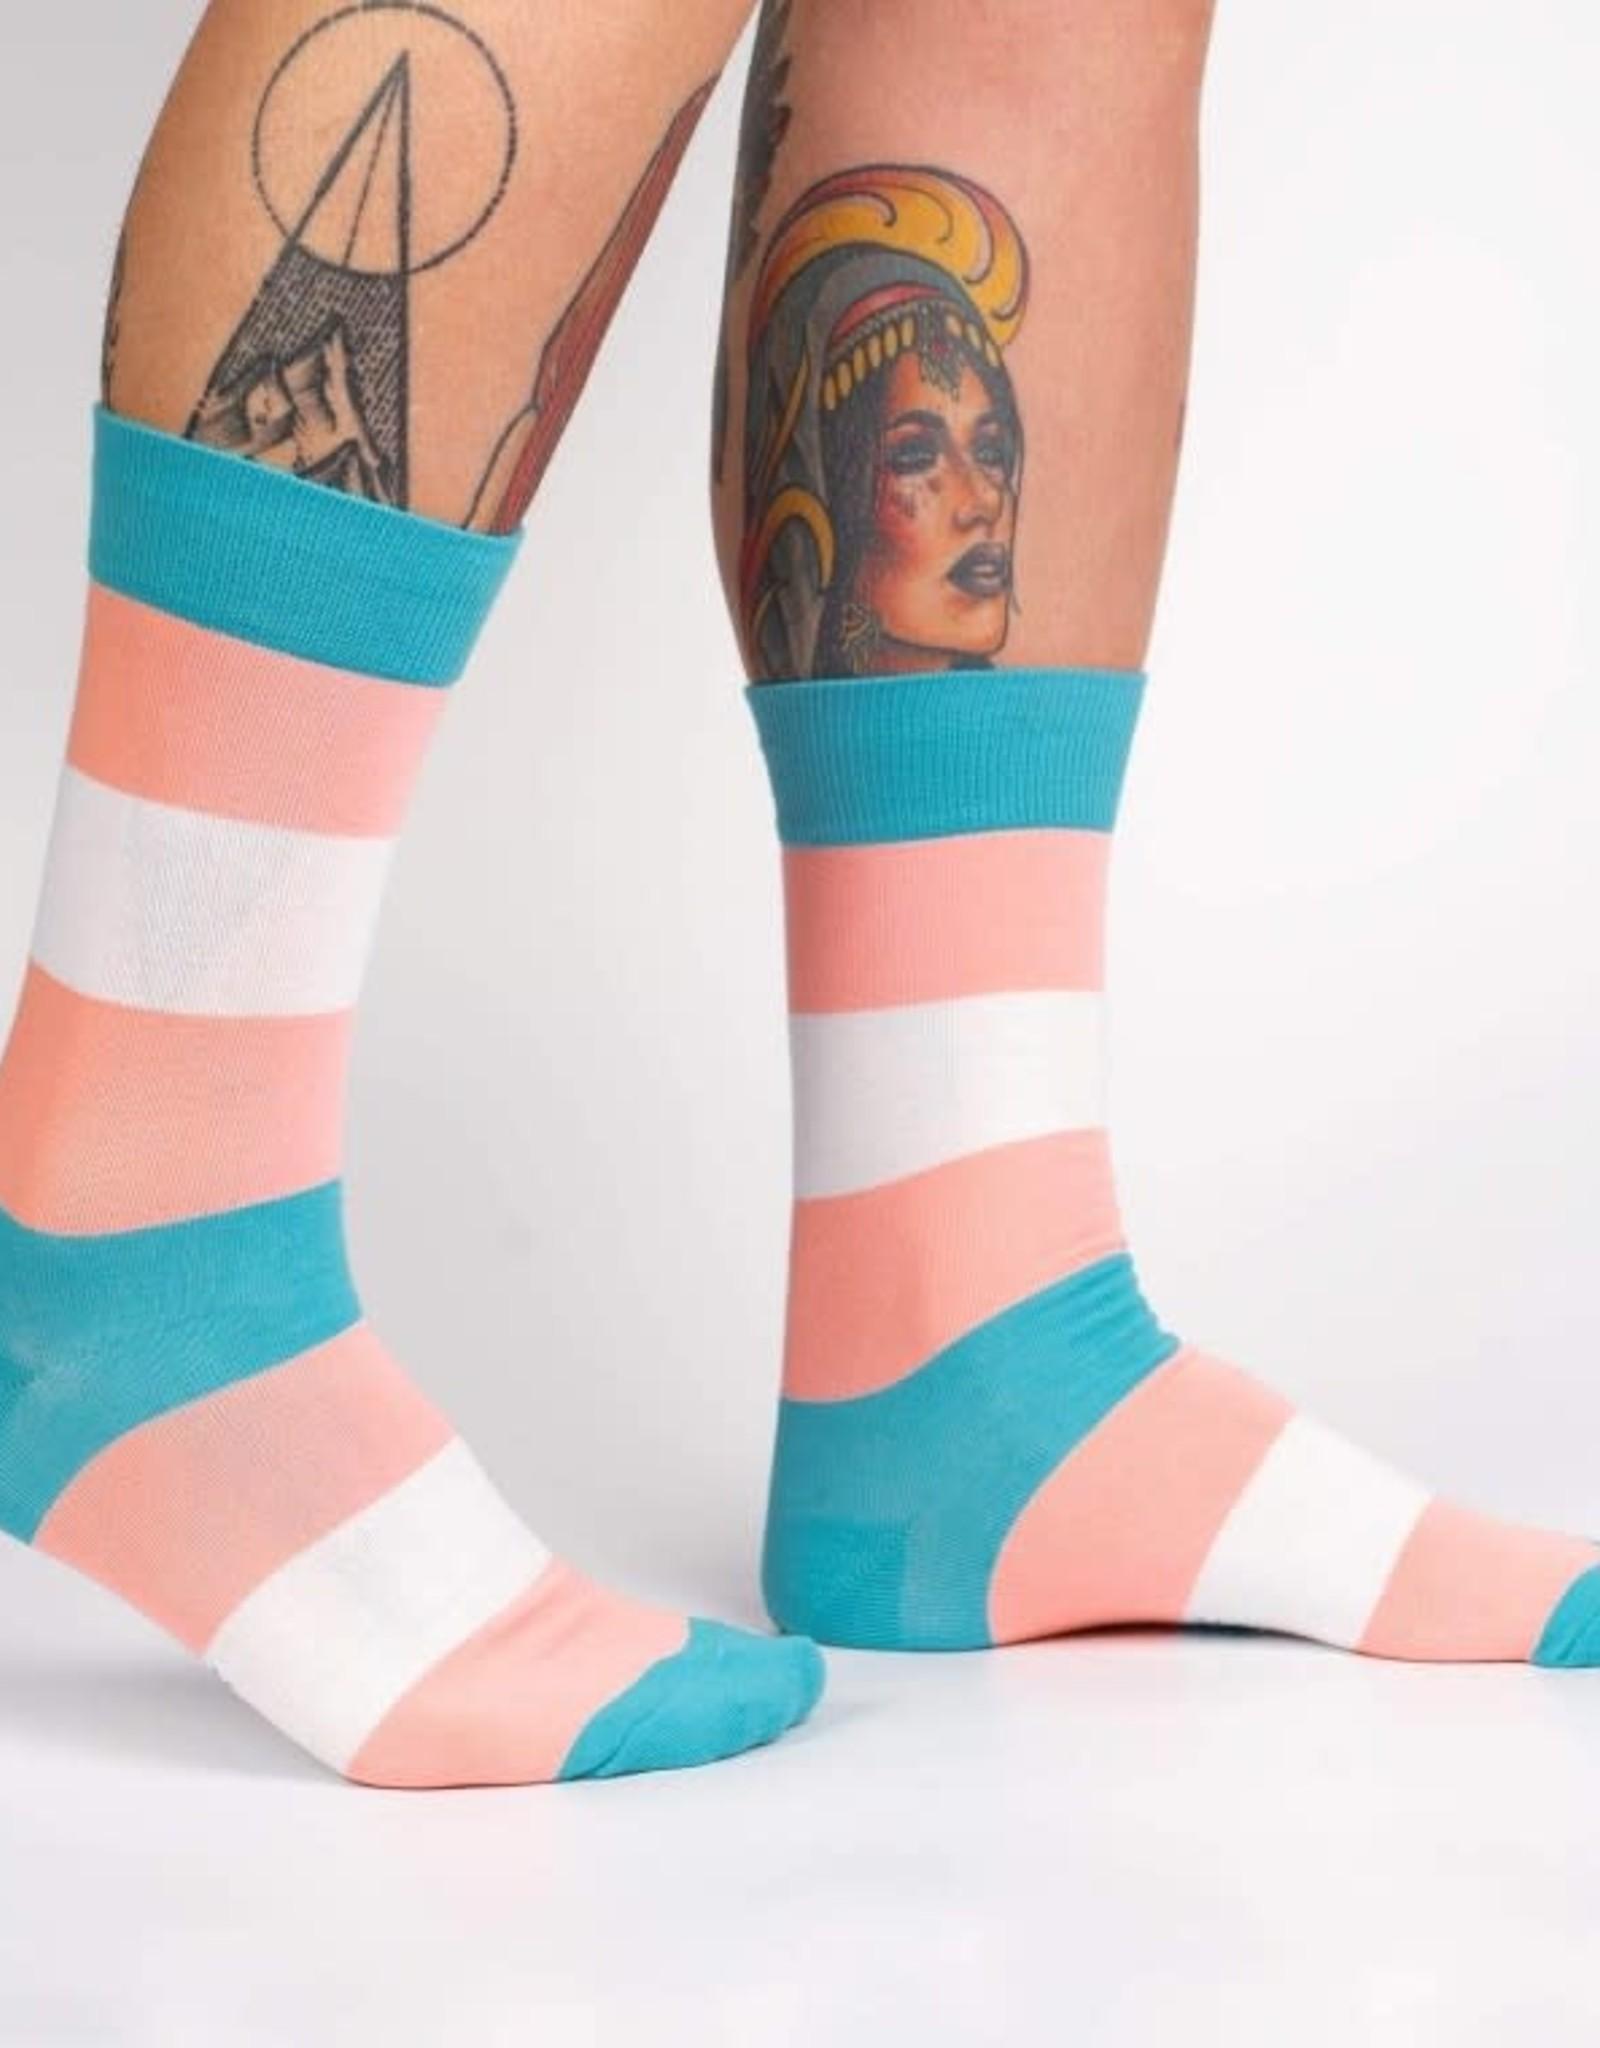 Sock it to Me SOCK IT TO ME TRANS PRIDE SOCKS